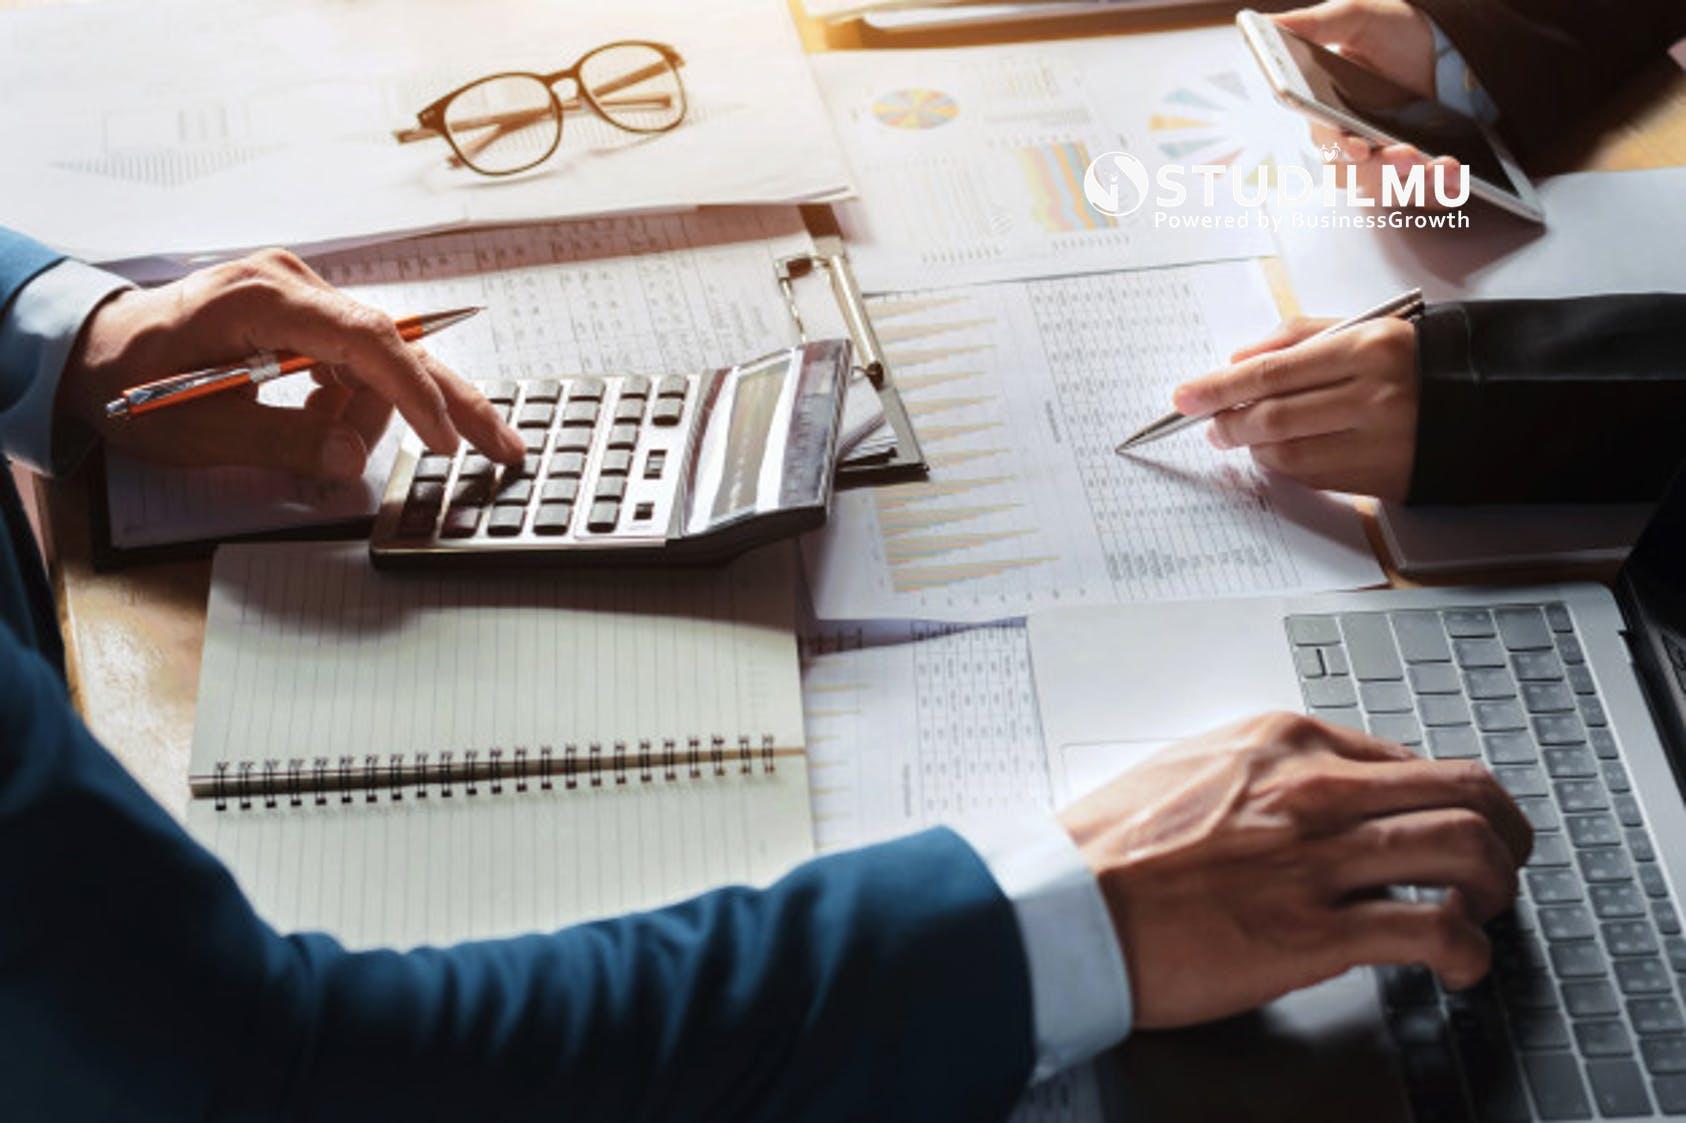 STUDILMU Career Advice - 15 Kebiasaan Mengatur Keuangan yang Sangat Penting